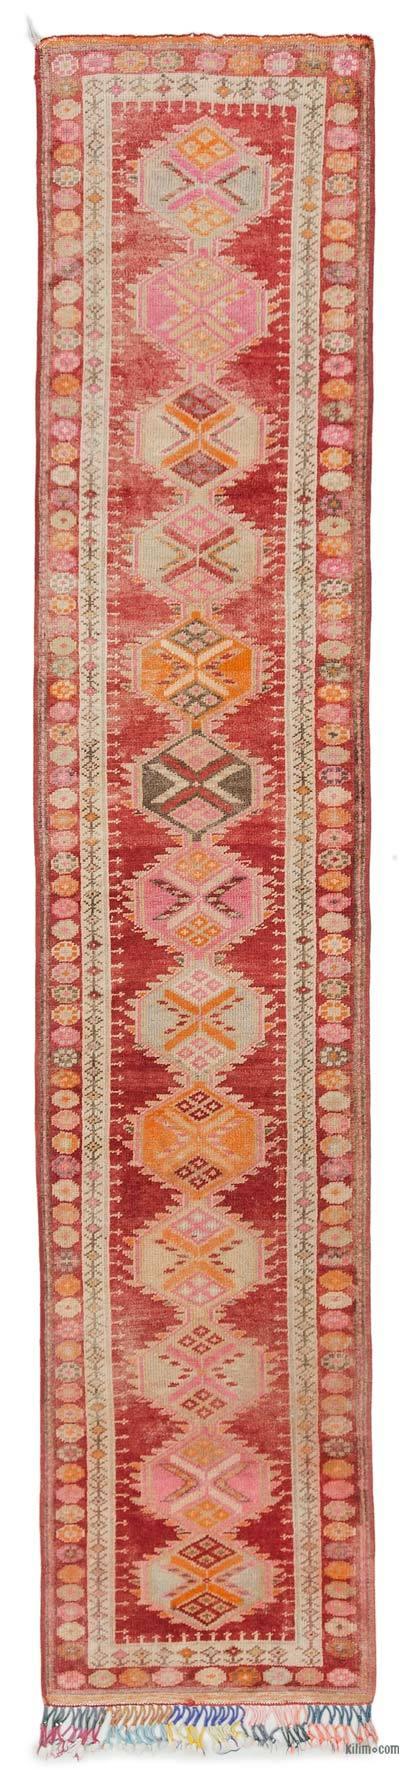 Vintage Turkish Runner Rug